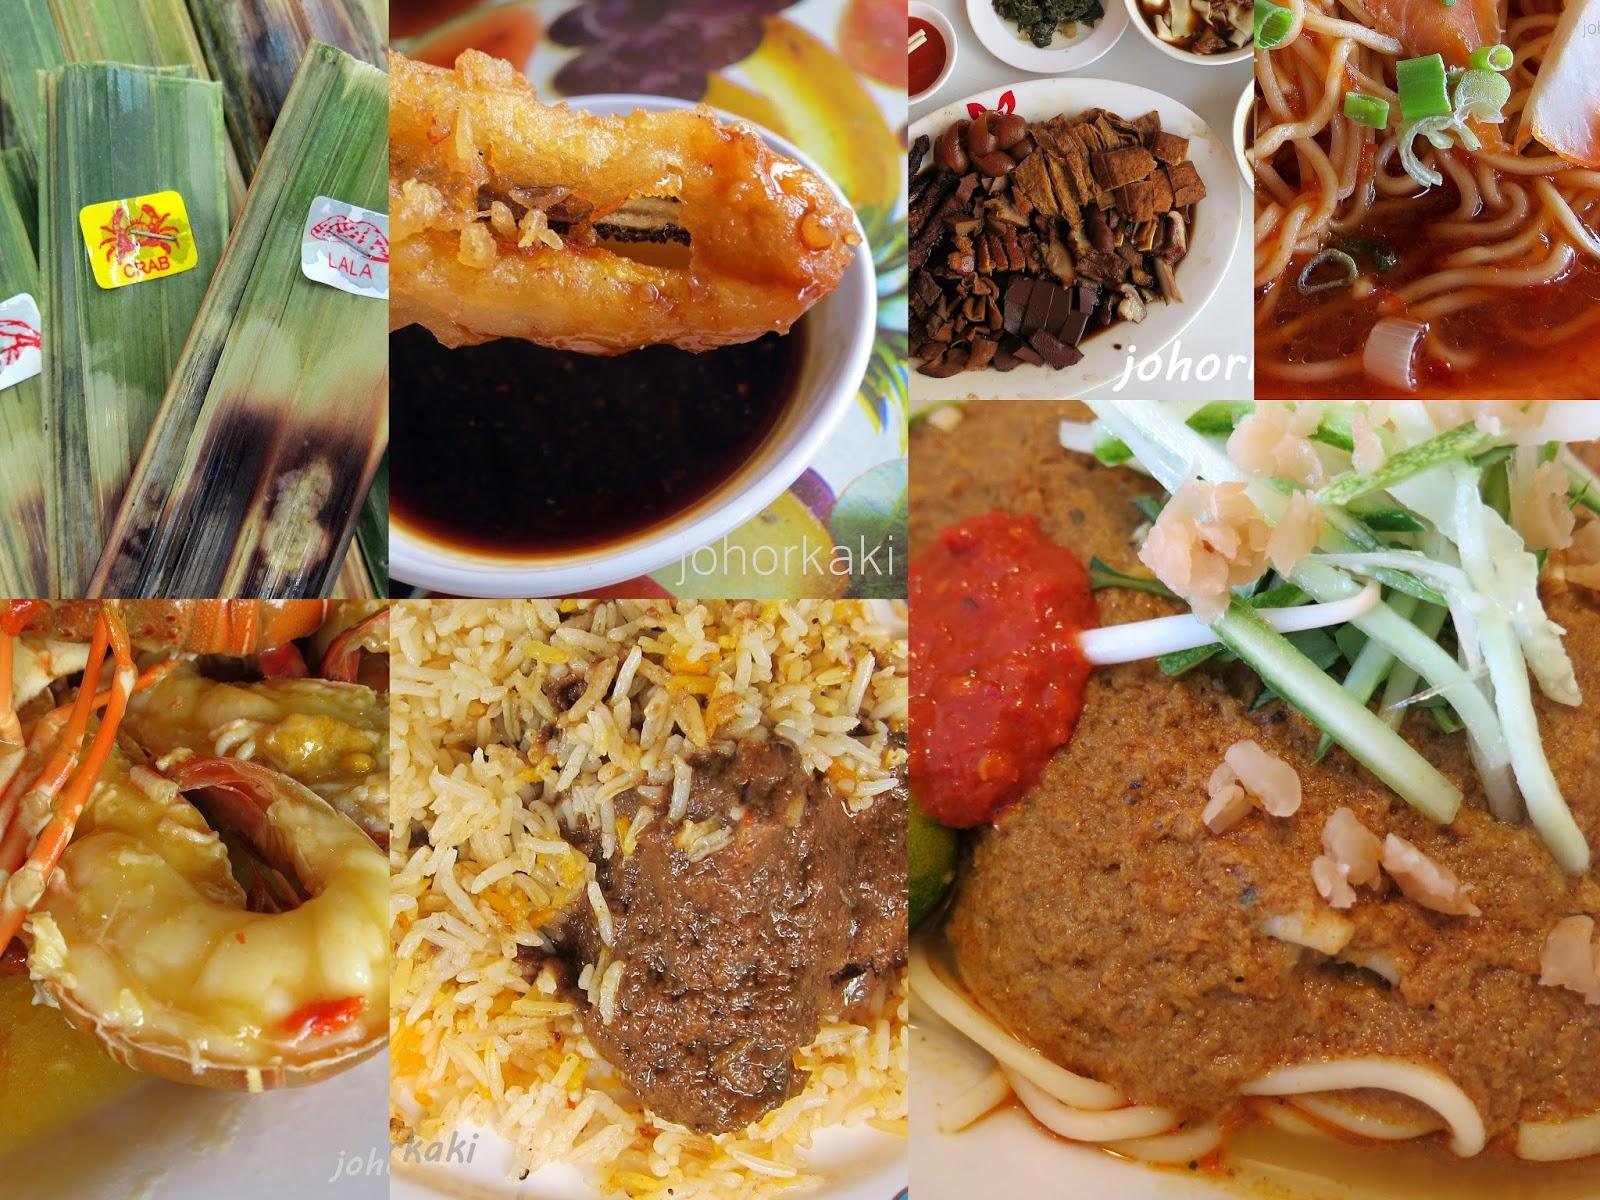 Johor kaki travels for food jb malaysia singapore taiwan for Cuisine kaki